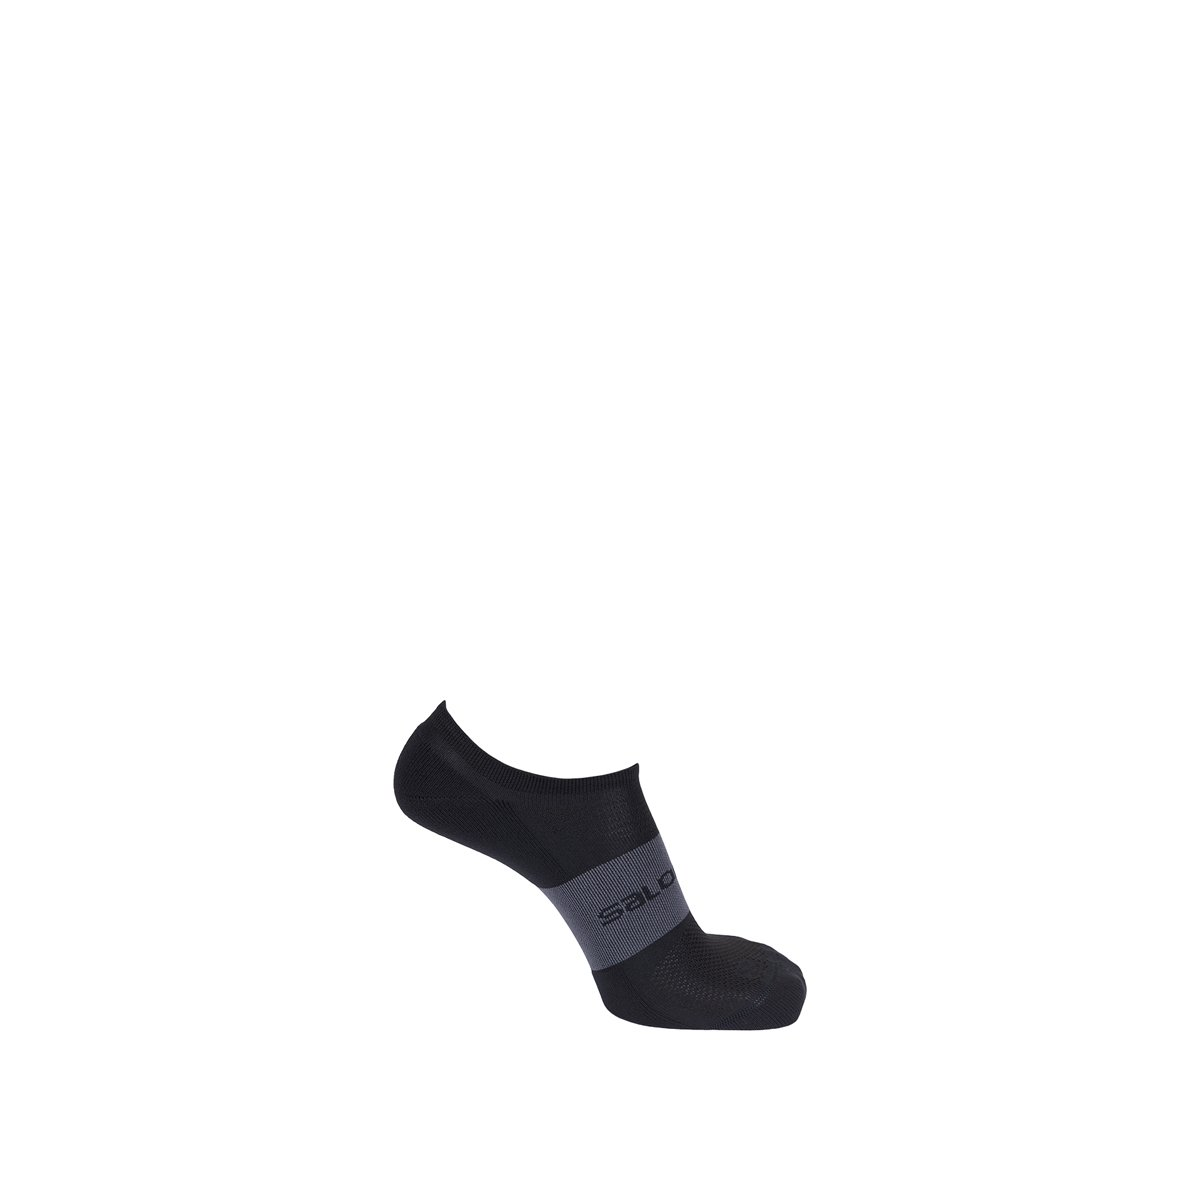 Носки Salomon SONIC 2-PACK черные; белые S